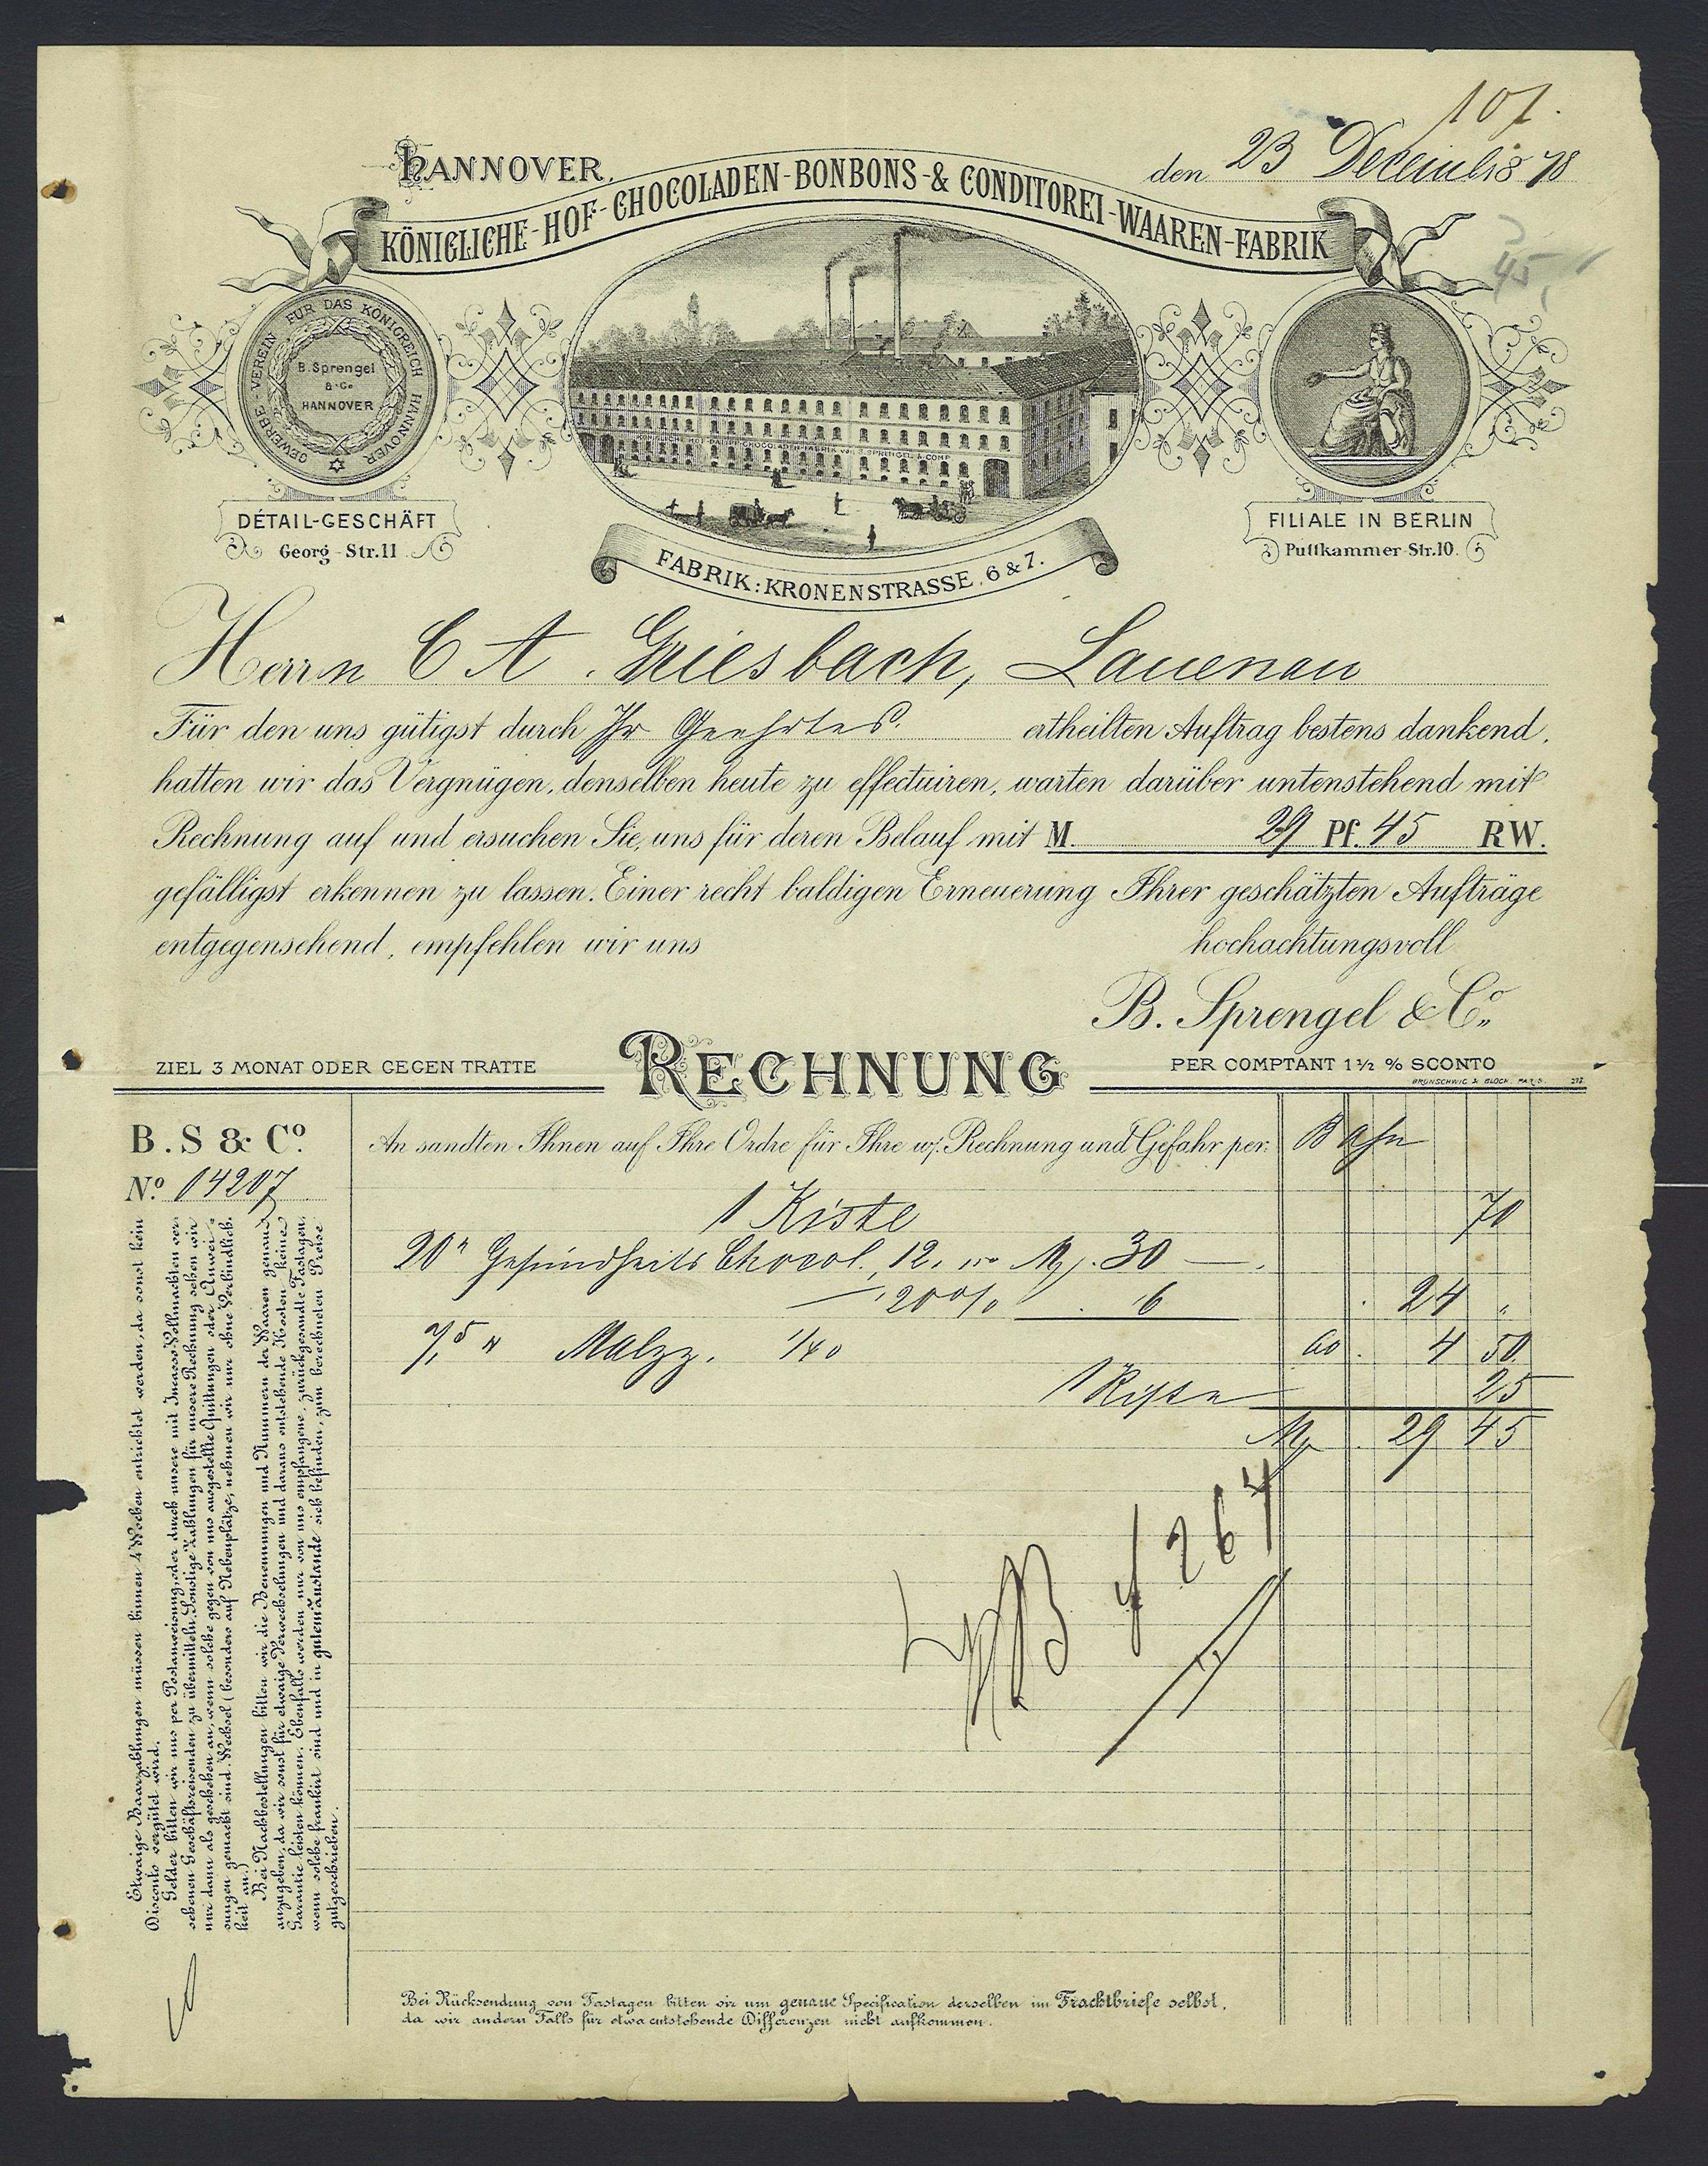 File:B. Sprengel & Co. 1878-12-23 Hannover Kronenstraße 6 & 7 ...